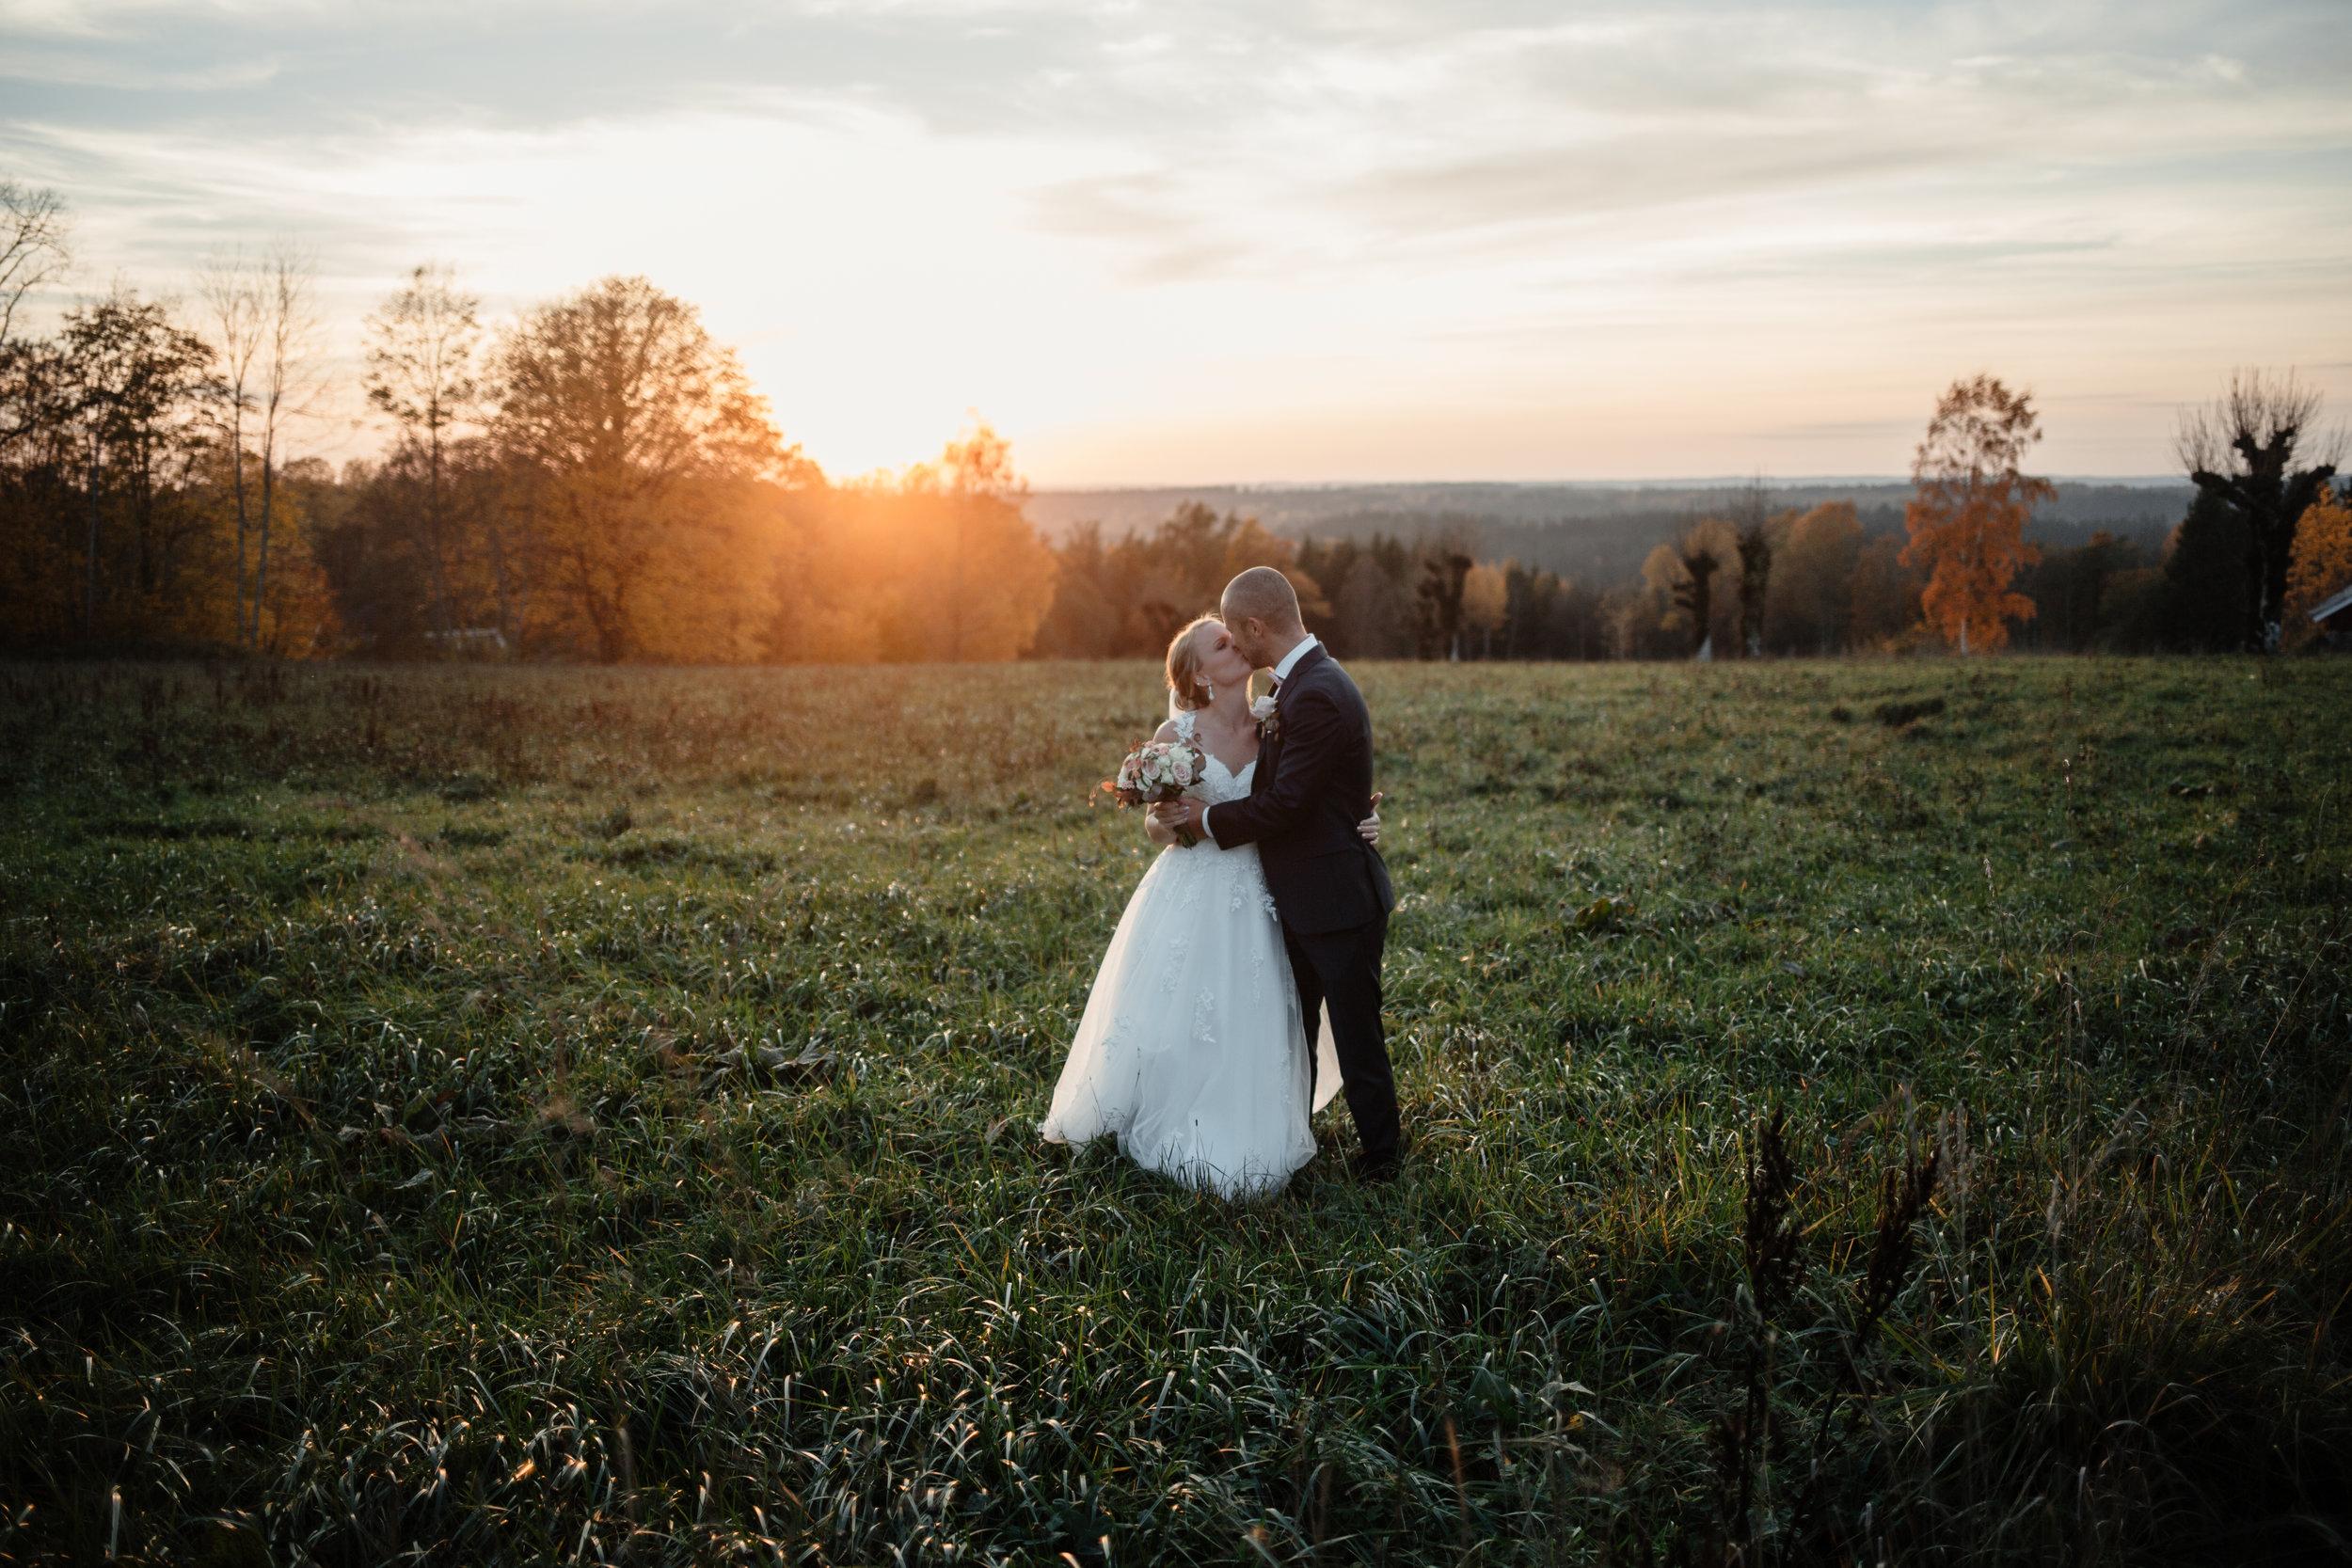 Bröllopsfotograf-Uddetorp Säteri-Höstbröllop-Fotograf Emilia- Bröllopsfotograf Borås-58.jpg